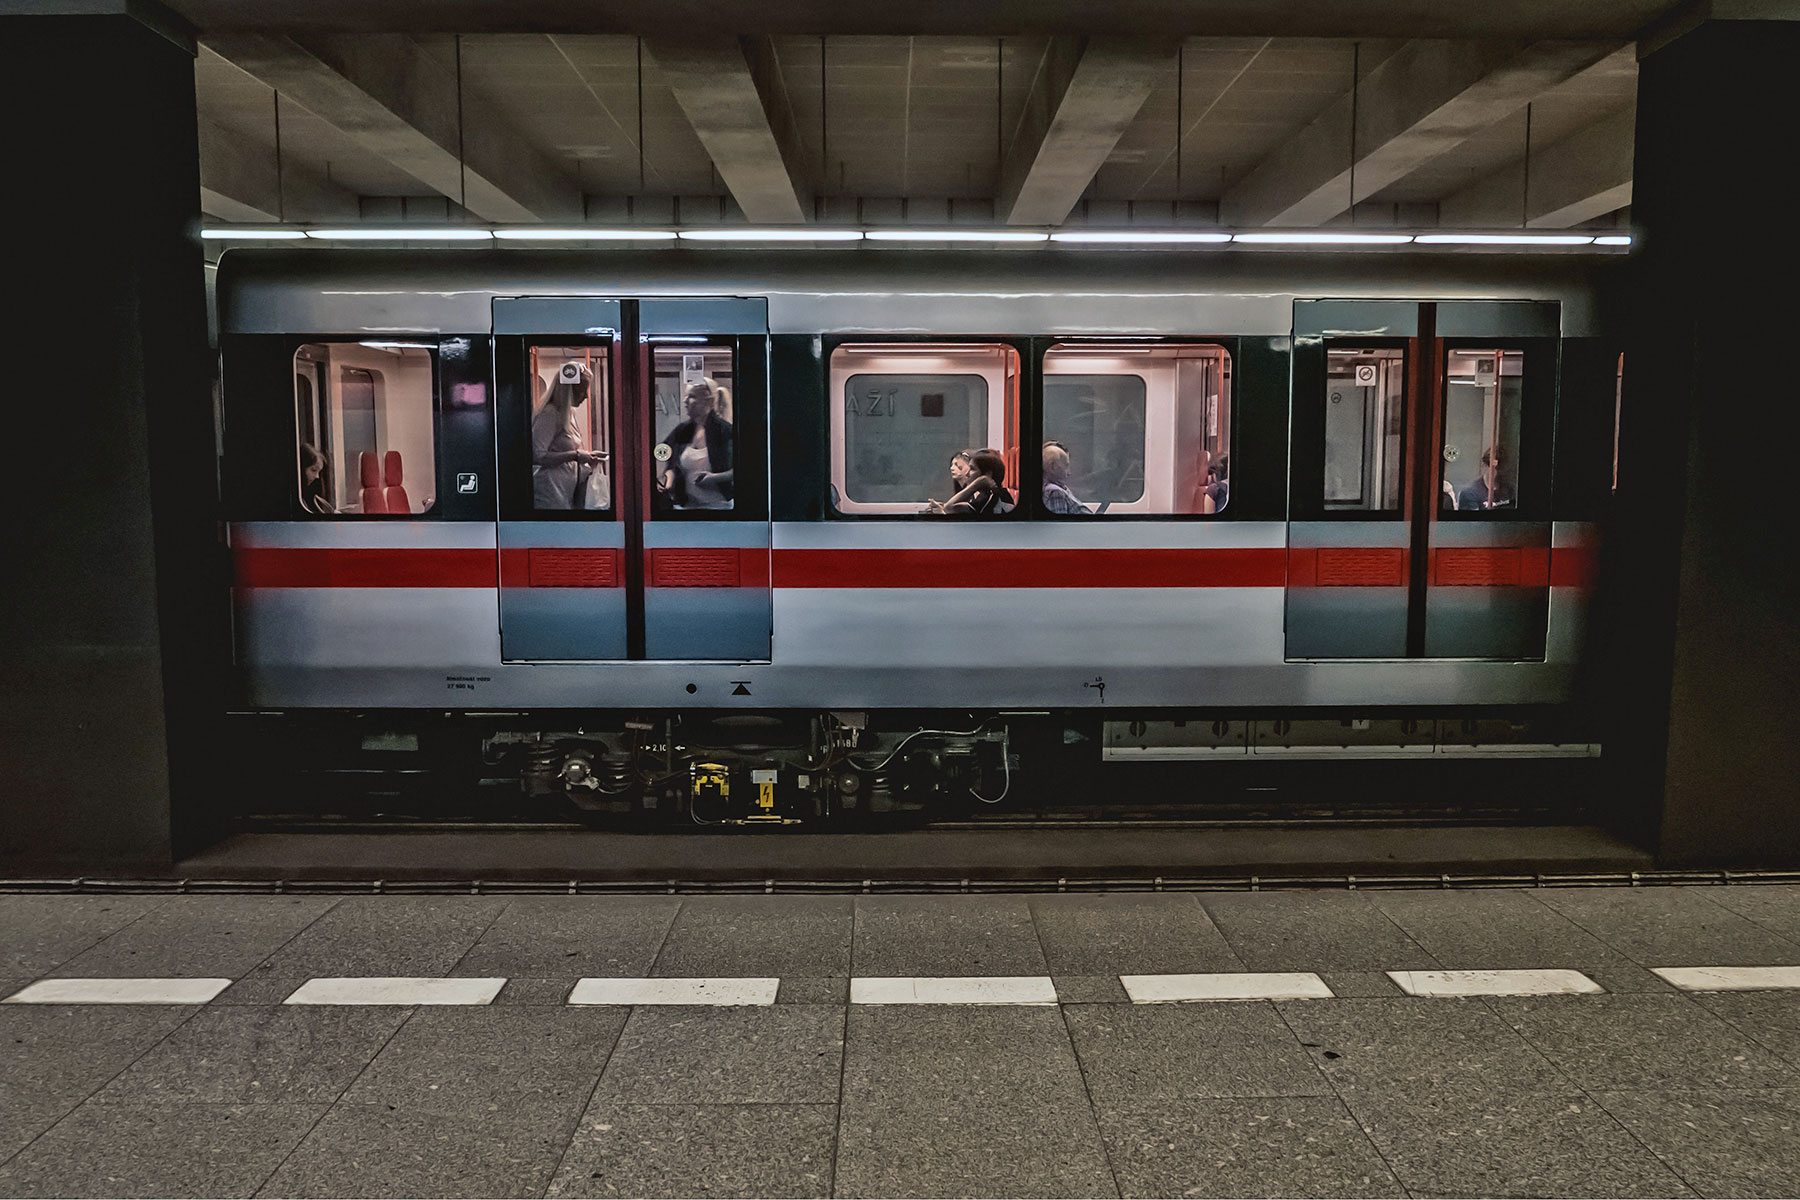 051818_transitstudy_02a